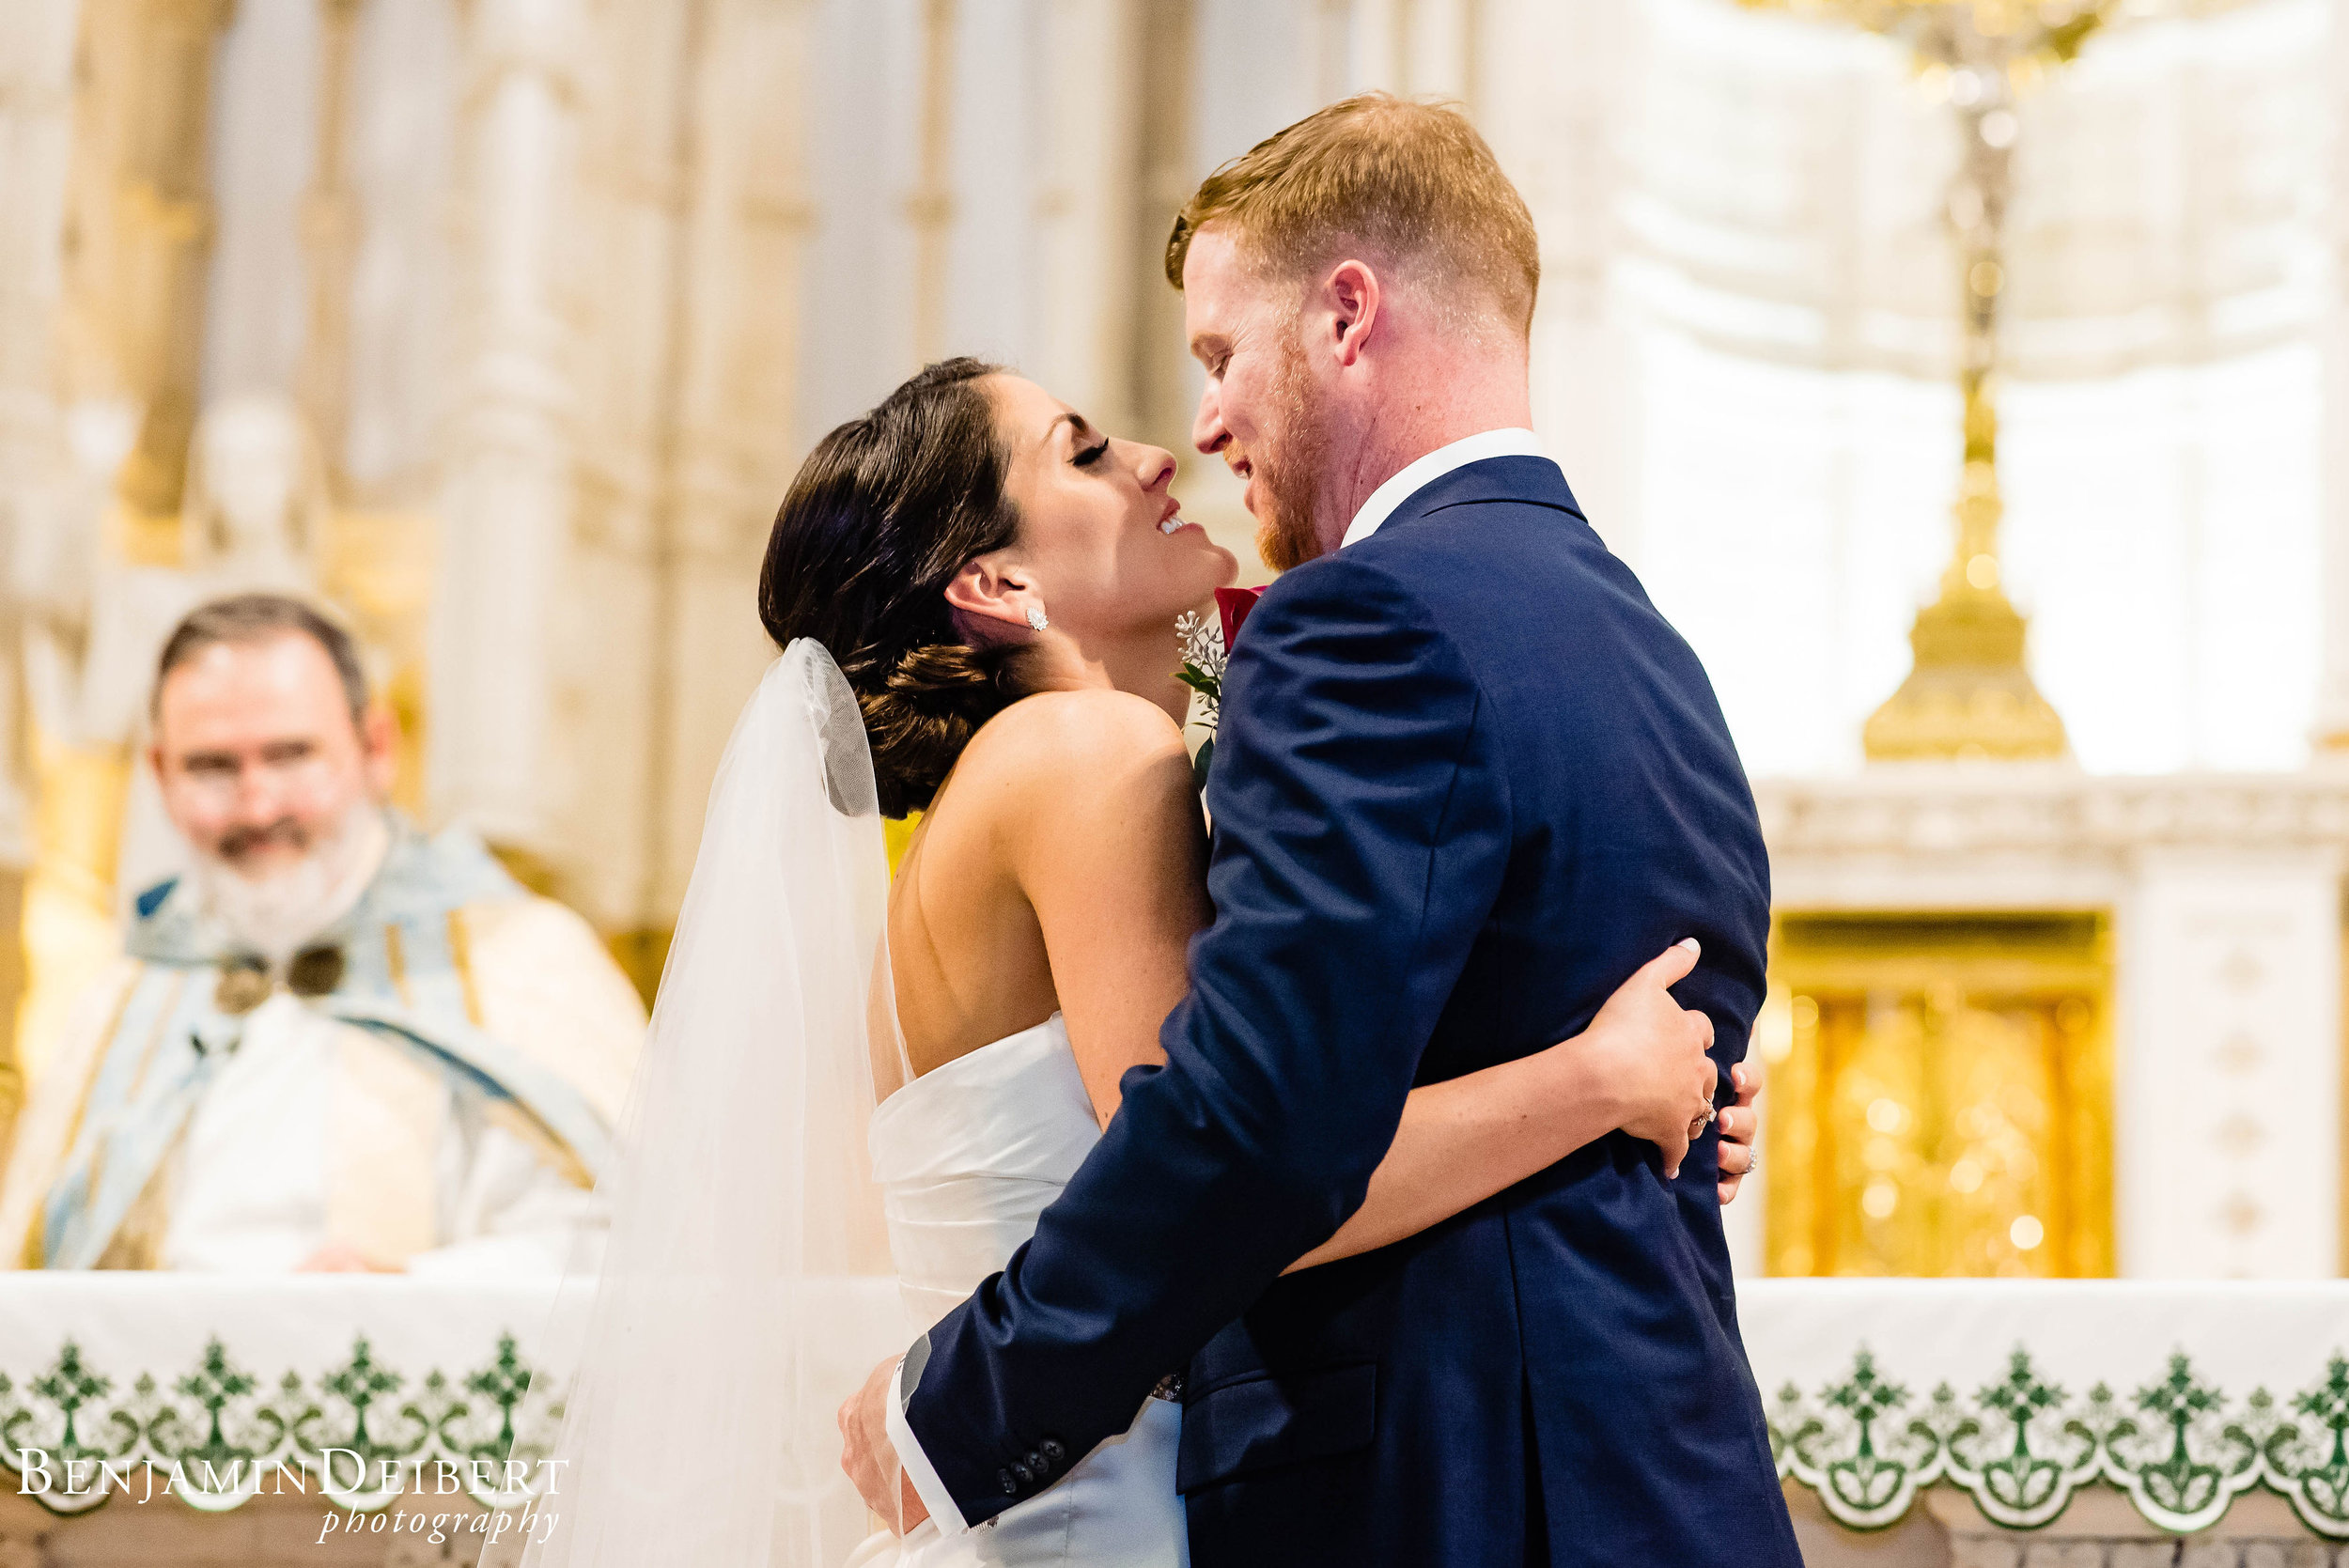 TeghanandChris_BridgemensBallroom_Wedding-52.jpg